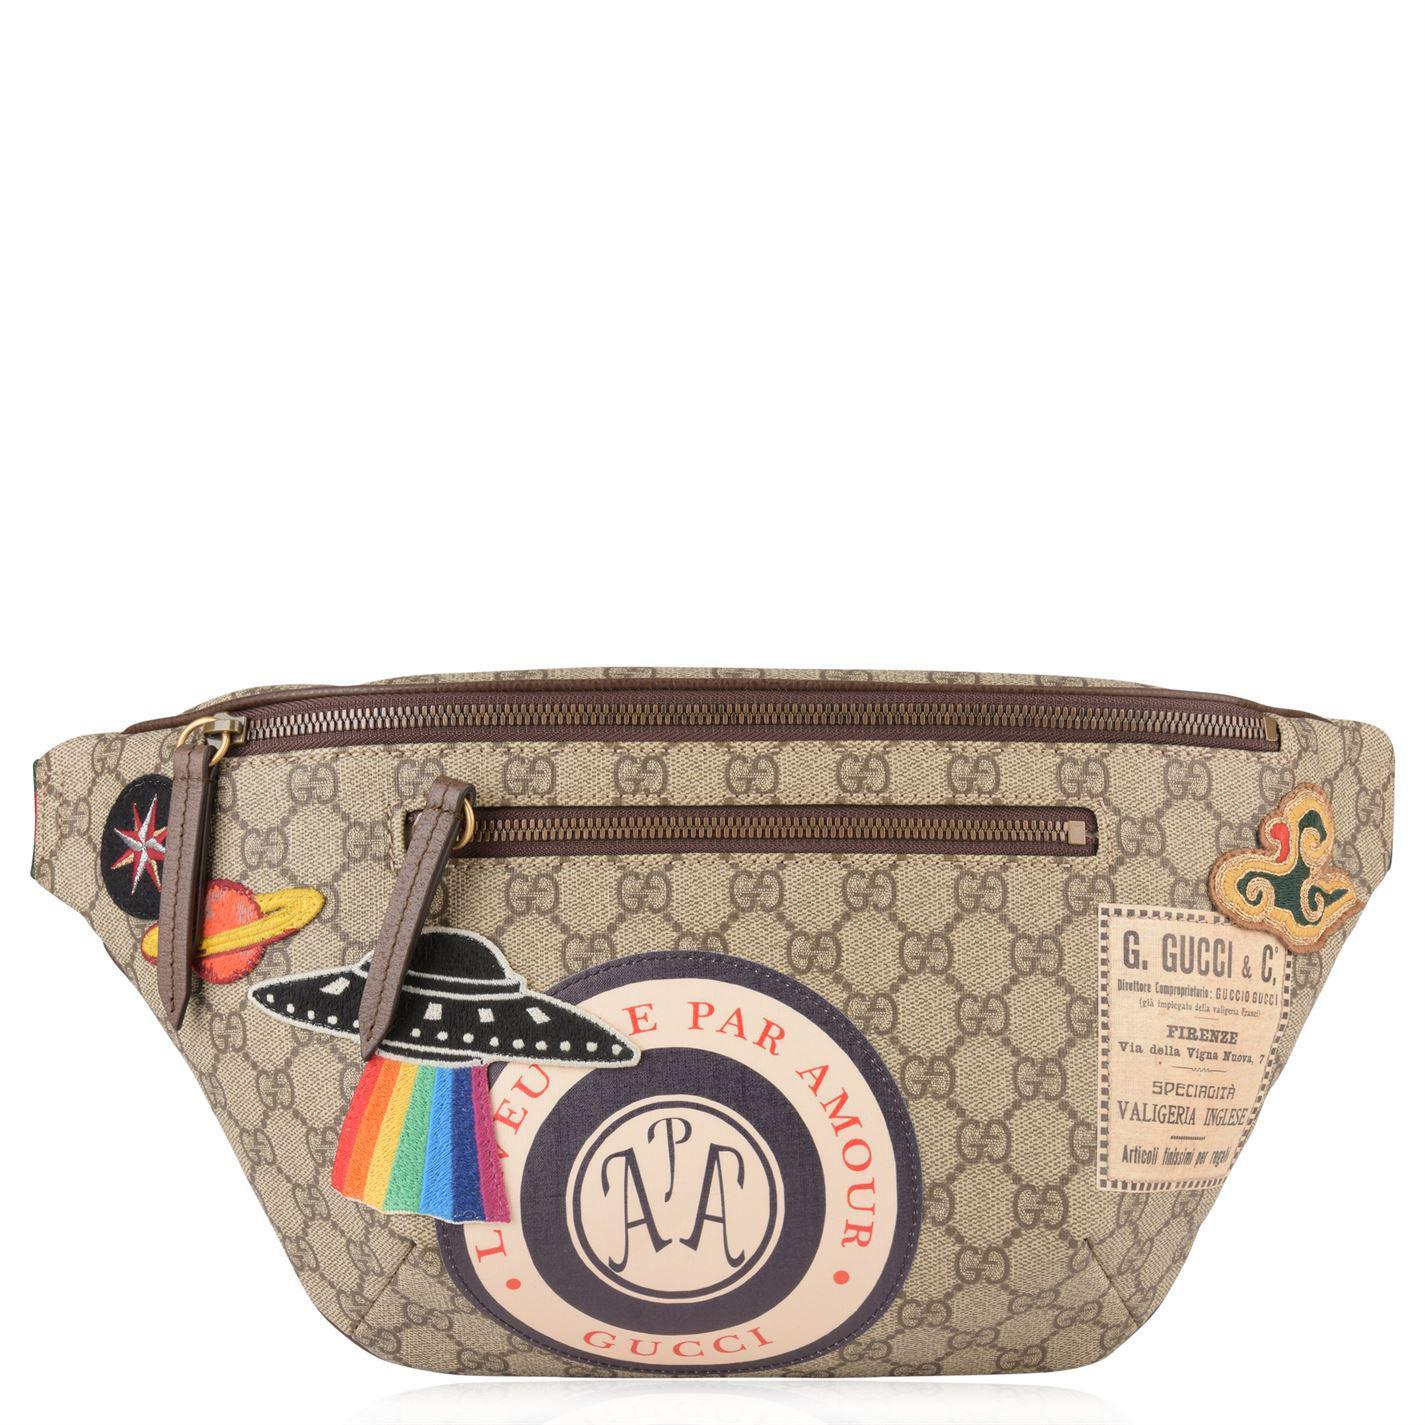 d3a3fc8a2be9 Gucci Gg Supreme Patch Belt Bag in Natural - Lyst